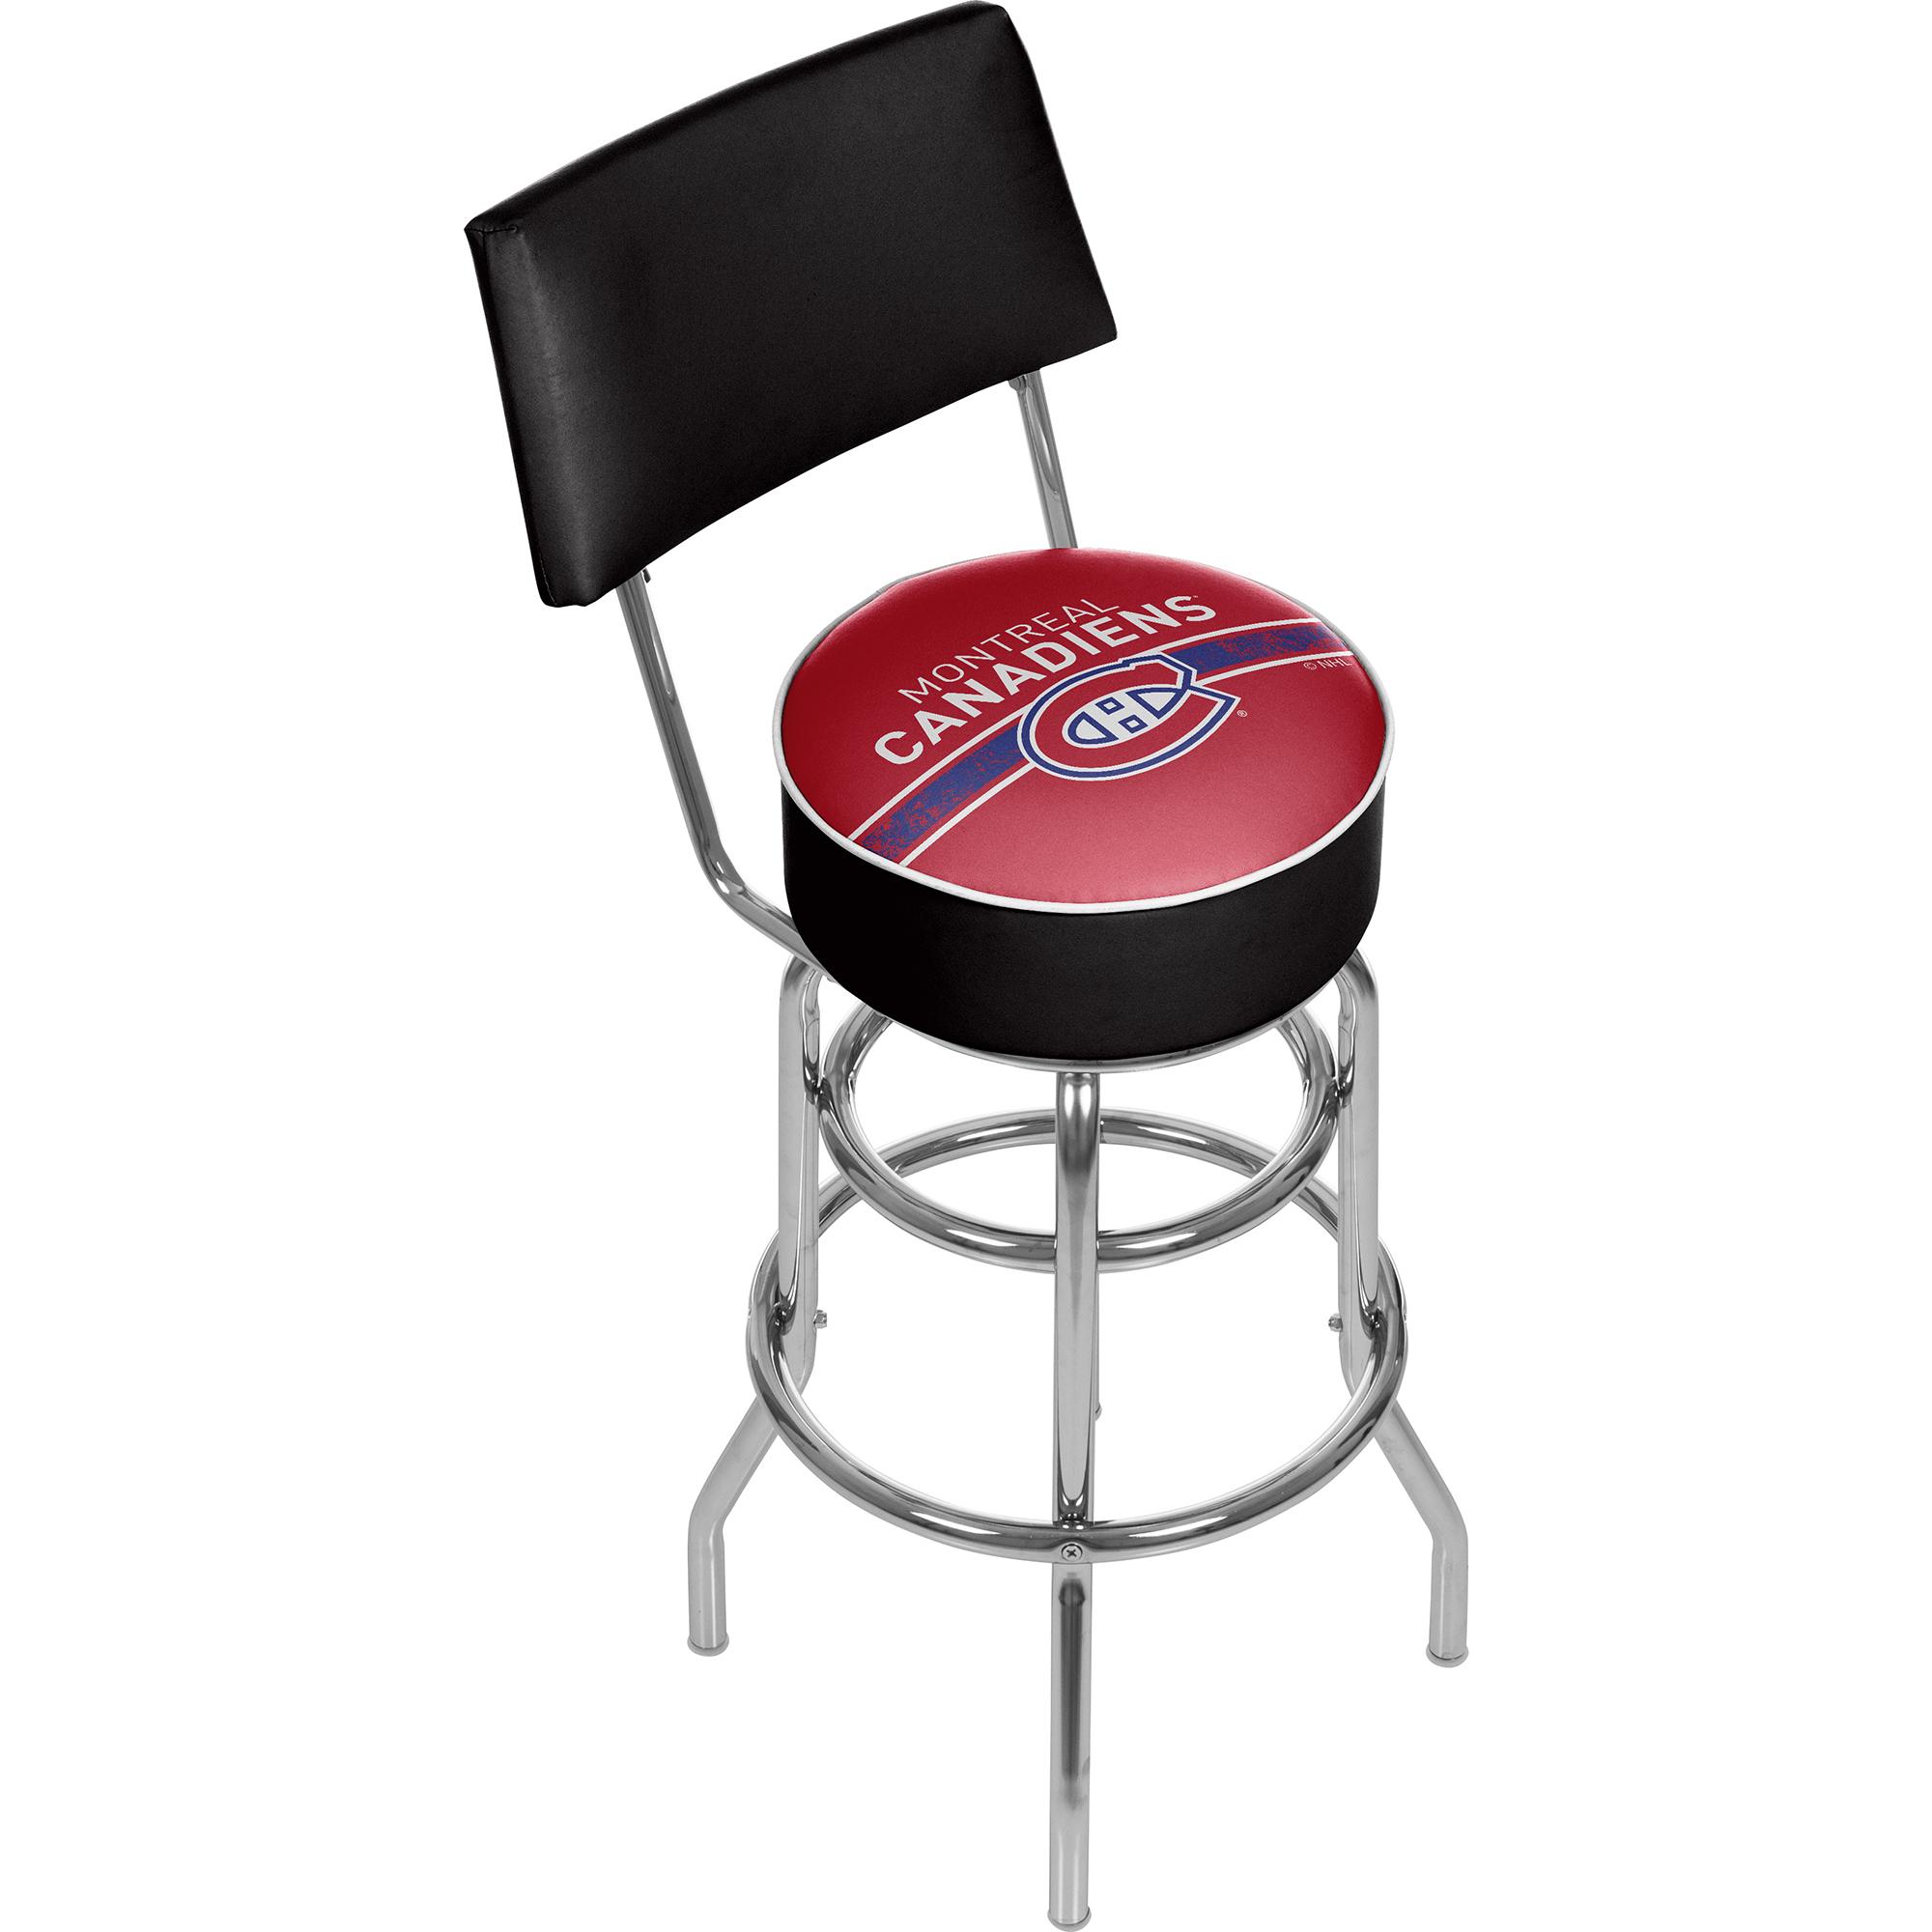 NHL Swivel Swivel Bar Stool with Back - Montreal Canadiens 589b8bebc98fc43a026d1110